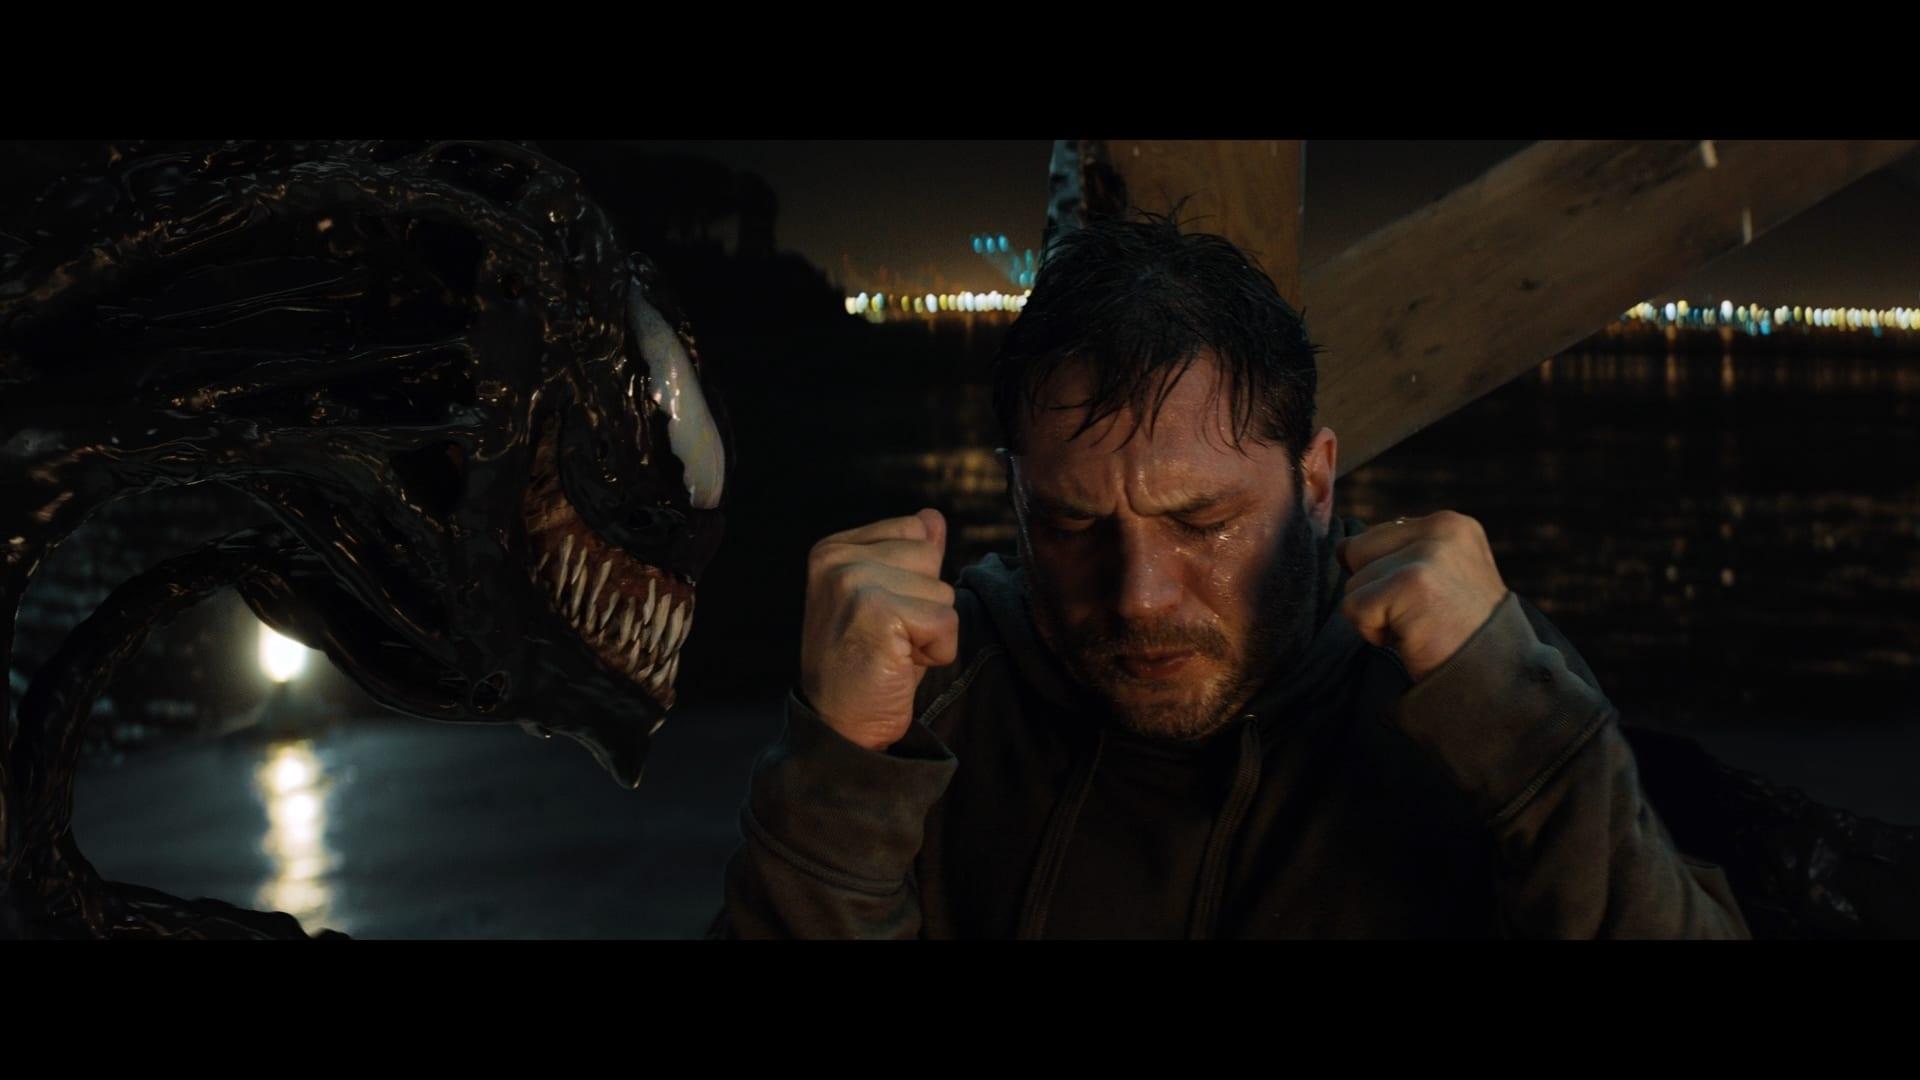 Venom Nous Sommes 4k Tests Blu Ray 4k Ultra Hd Digitalciné